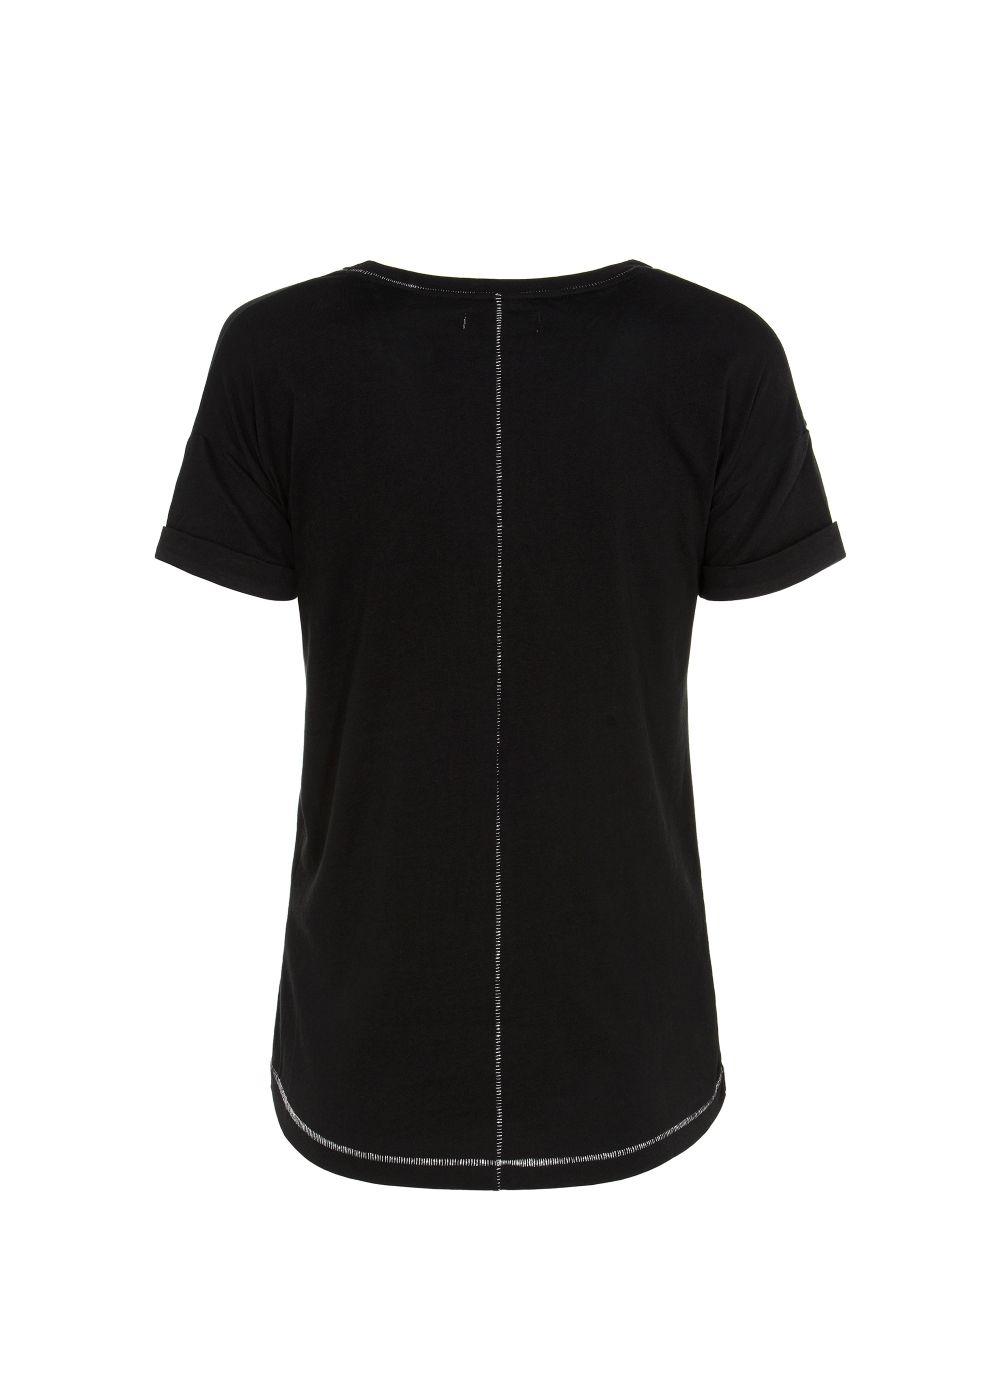 T-shirt damski TSHDT-0026-99(W19)